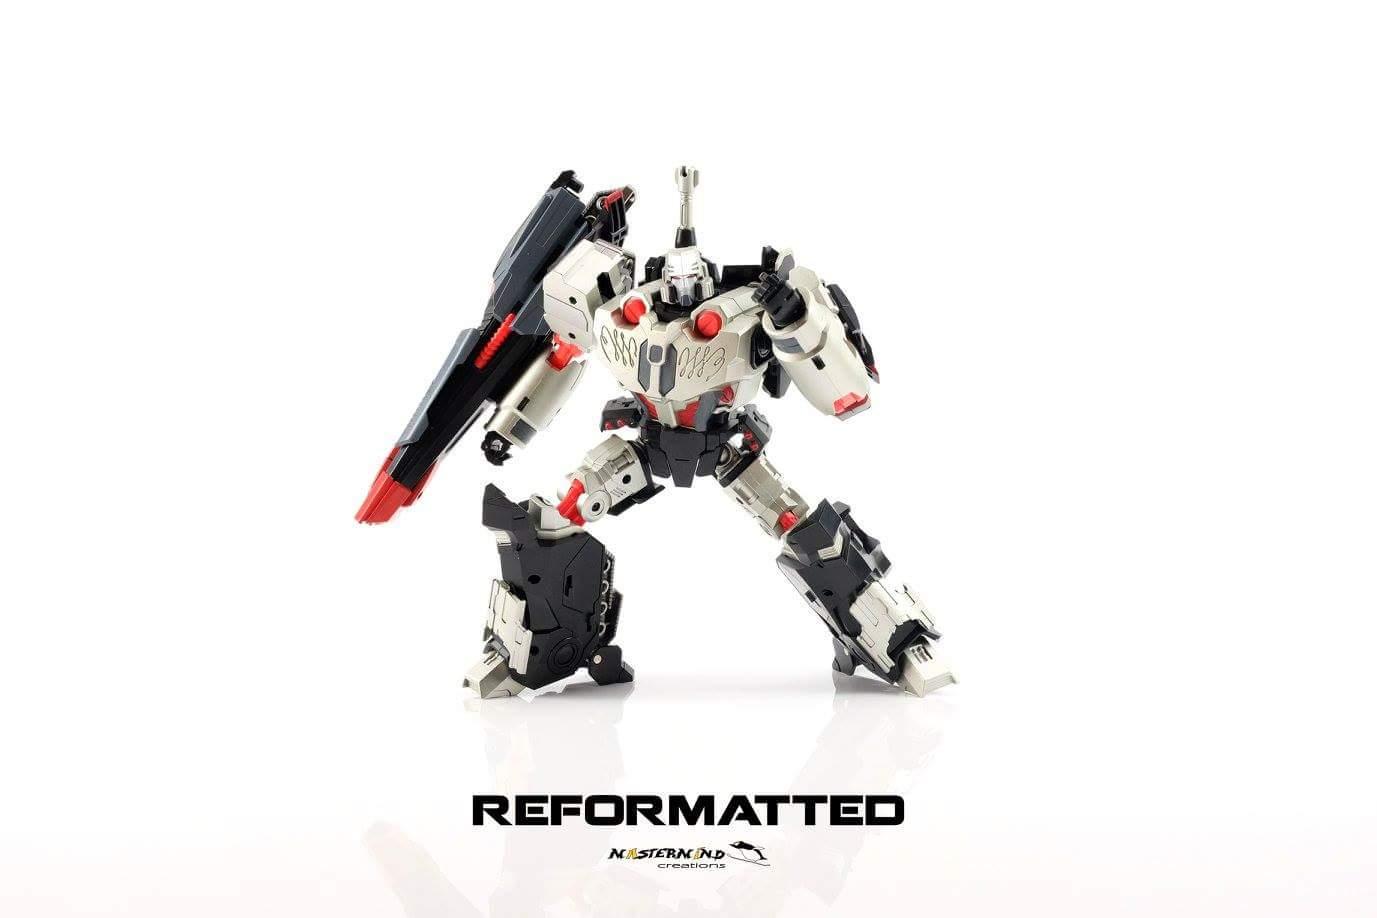 [Mastermind Creations] Produit Tiers - Reformatted R-28 Tyrantron - aka Megatron des BD IDW FDhS0jqe